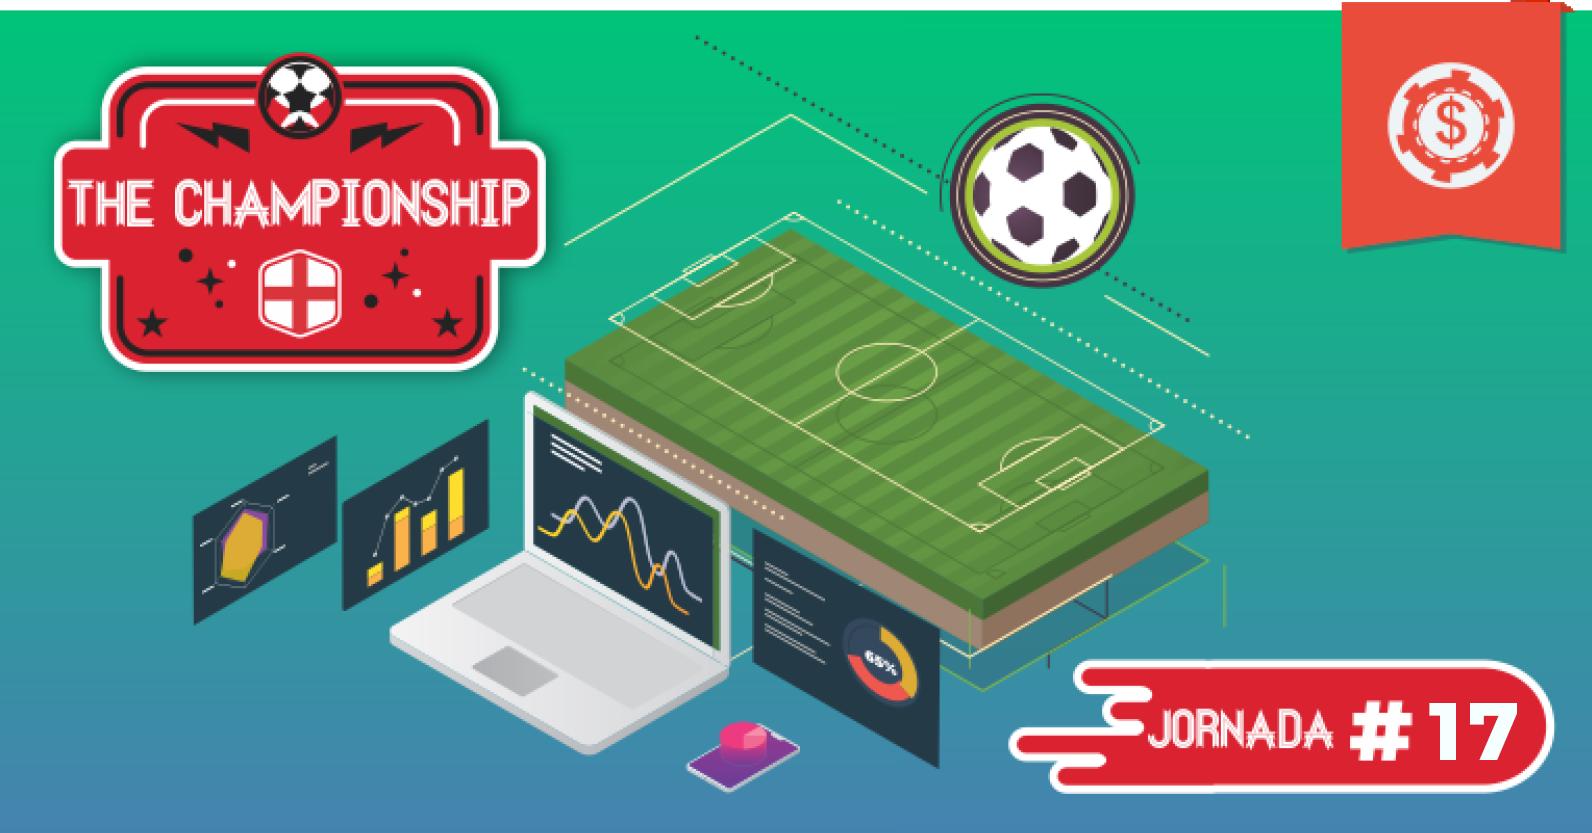 pronosticos-championship-segunda-division-inglesa-apuestas-jornada-17-1